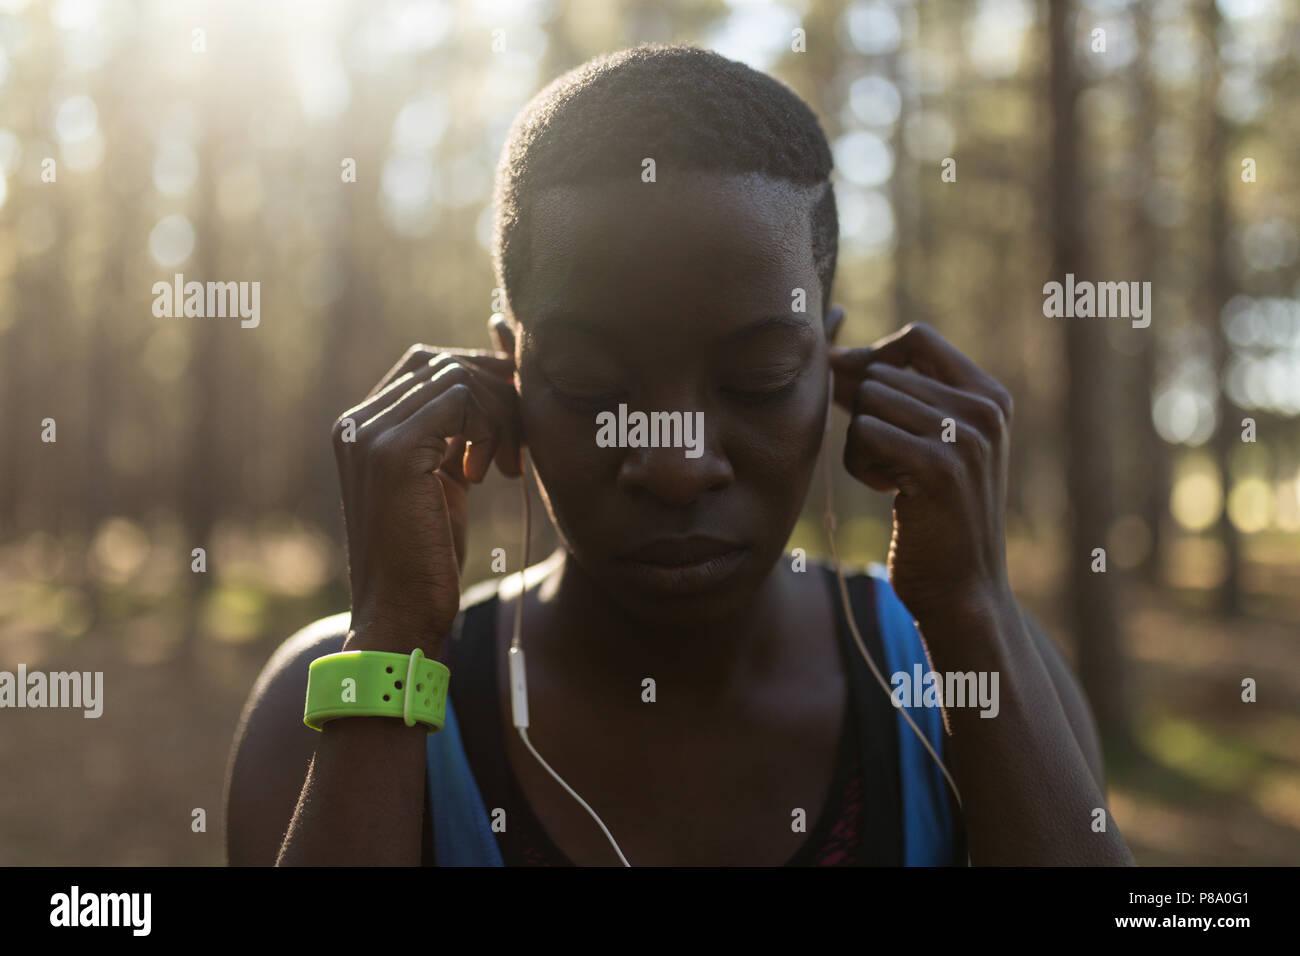 Female athlete listening to music in headphones - Stock Image